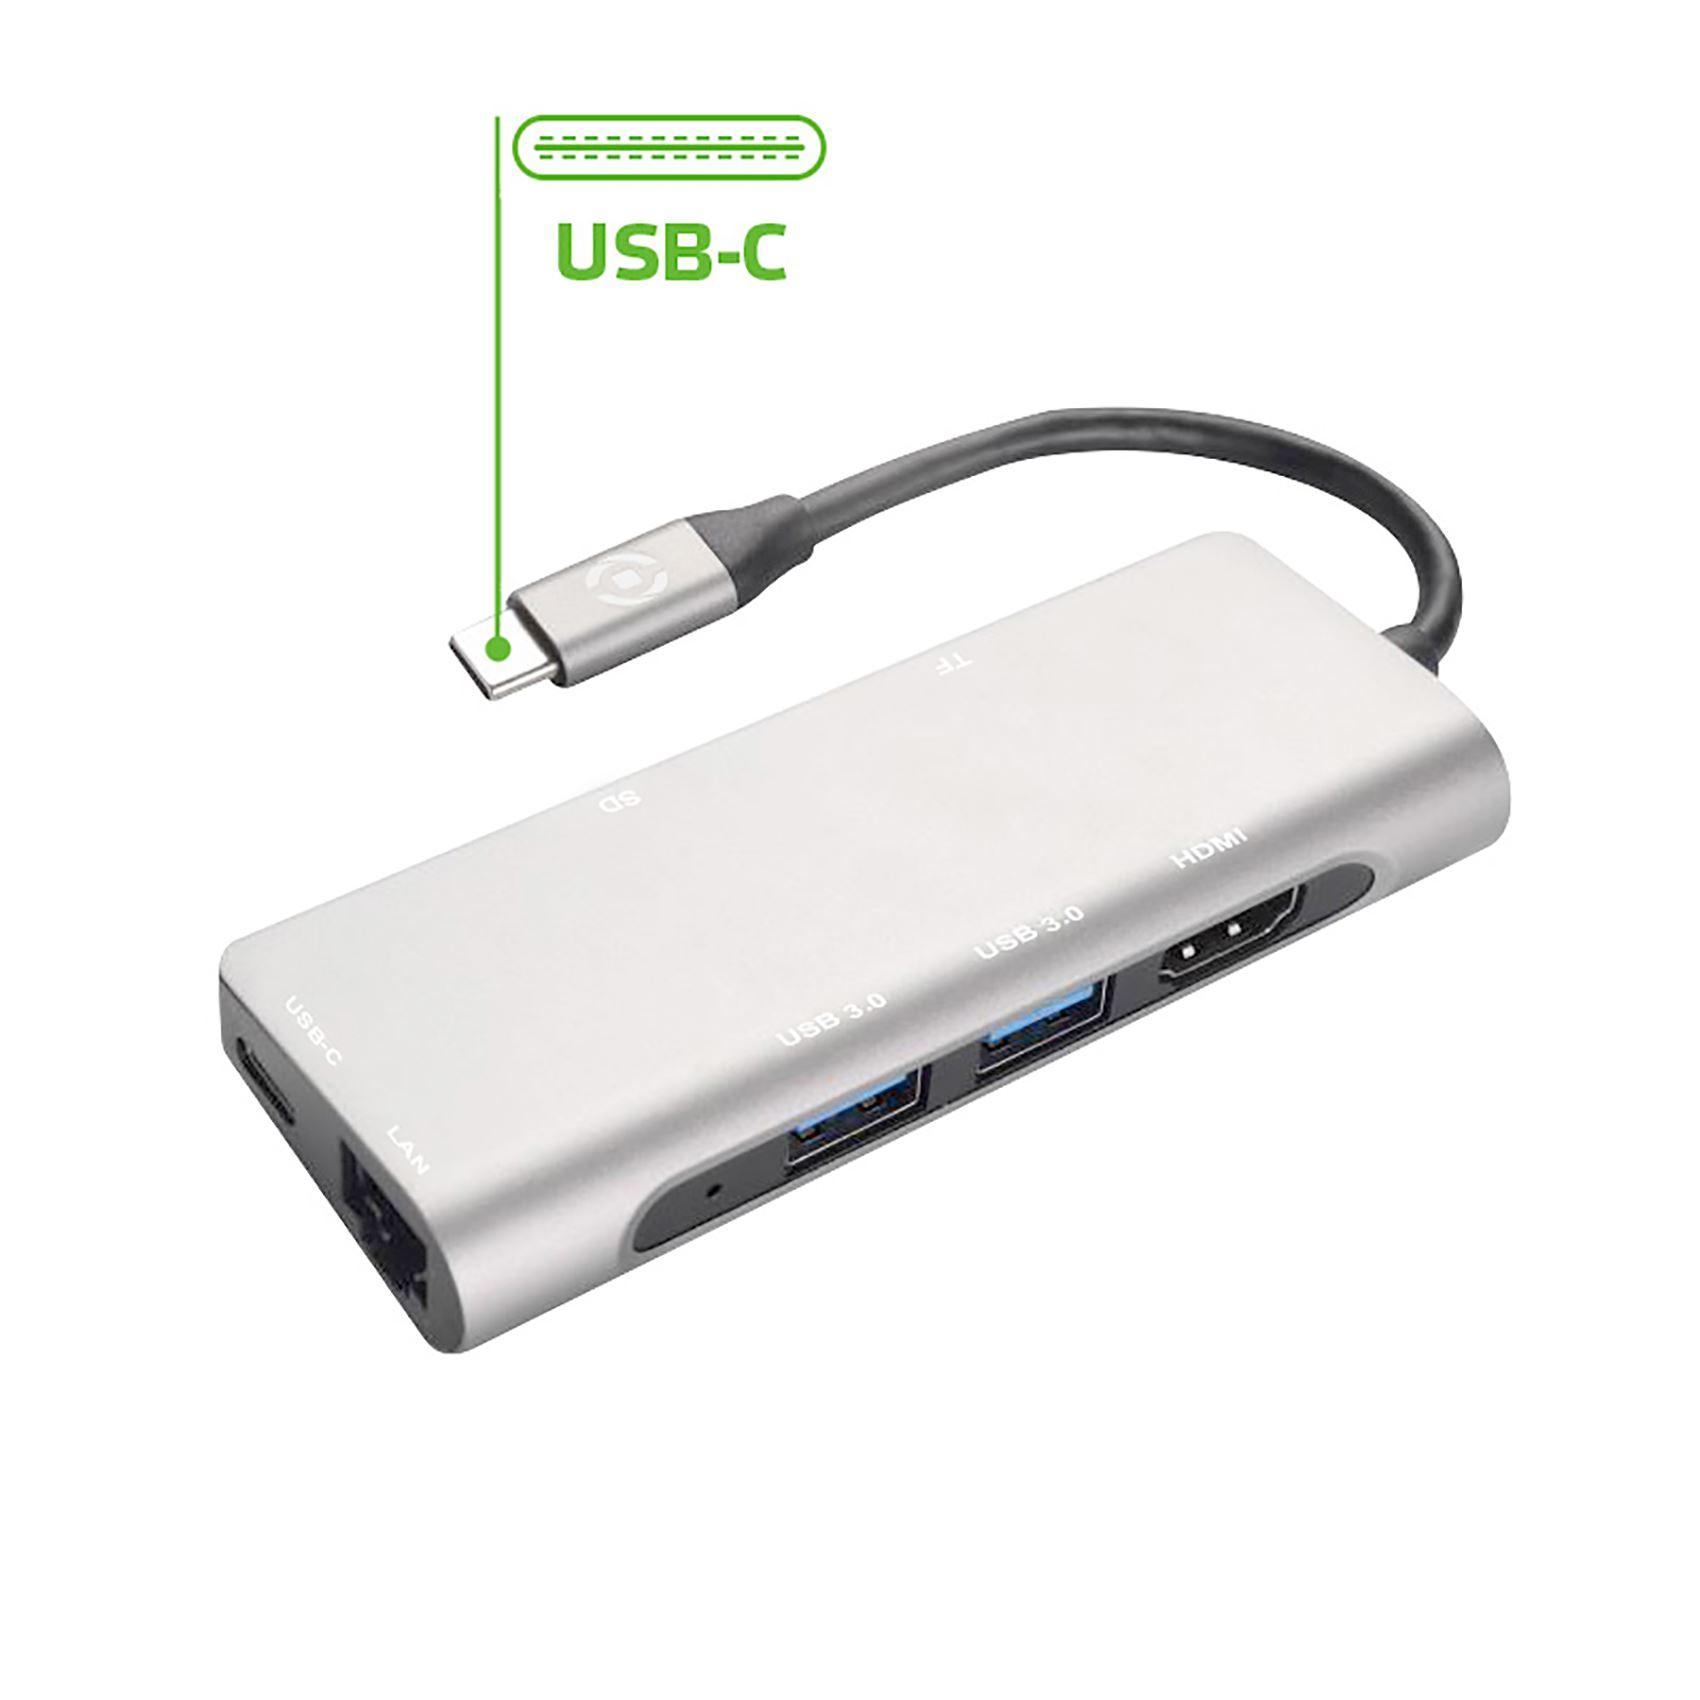 PRO HUB EVO - USB-C Adapter [SMART WORKING]